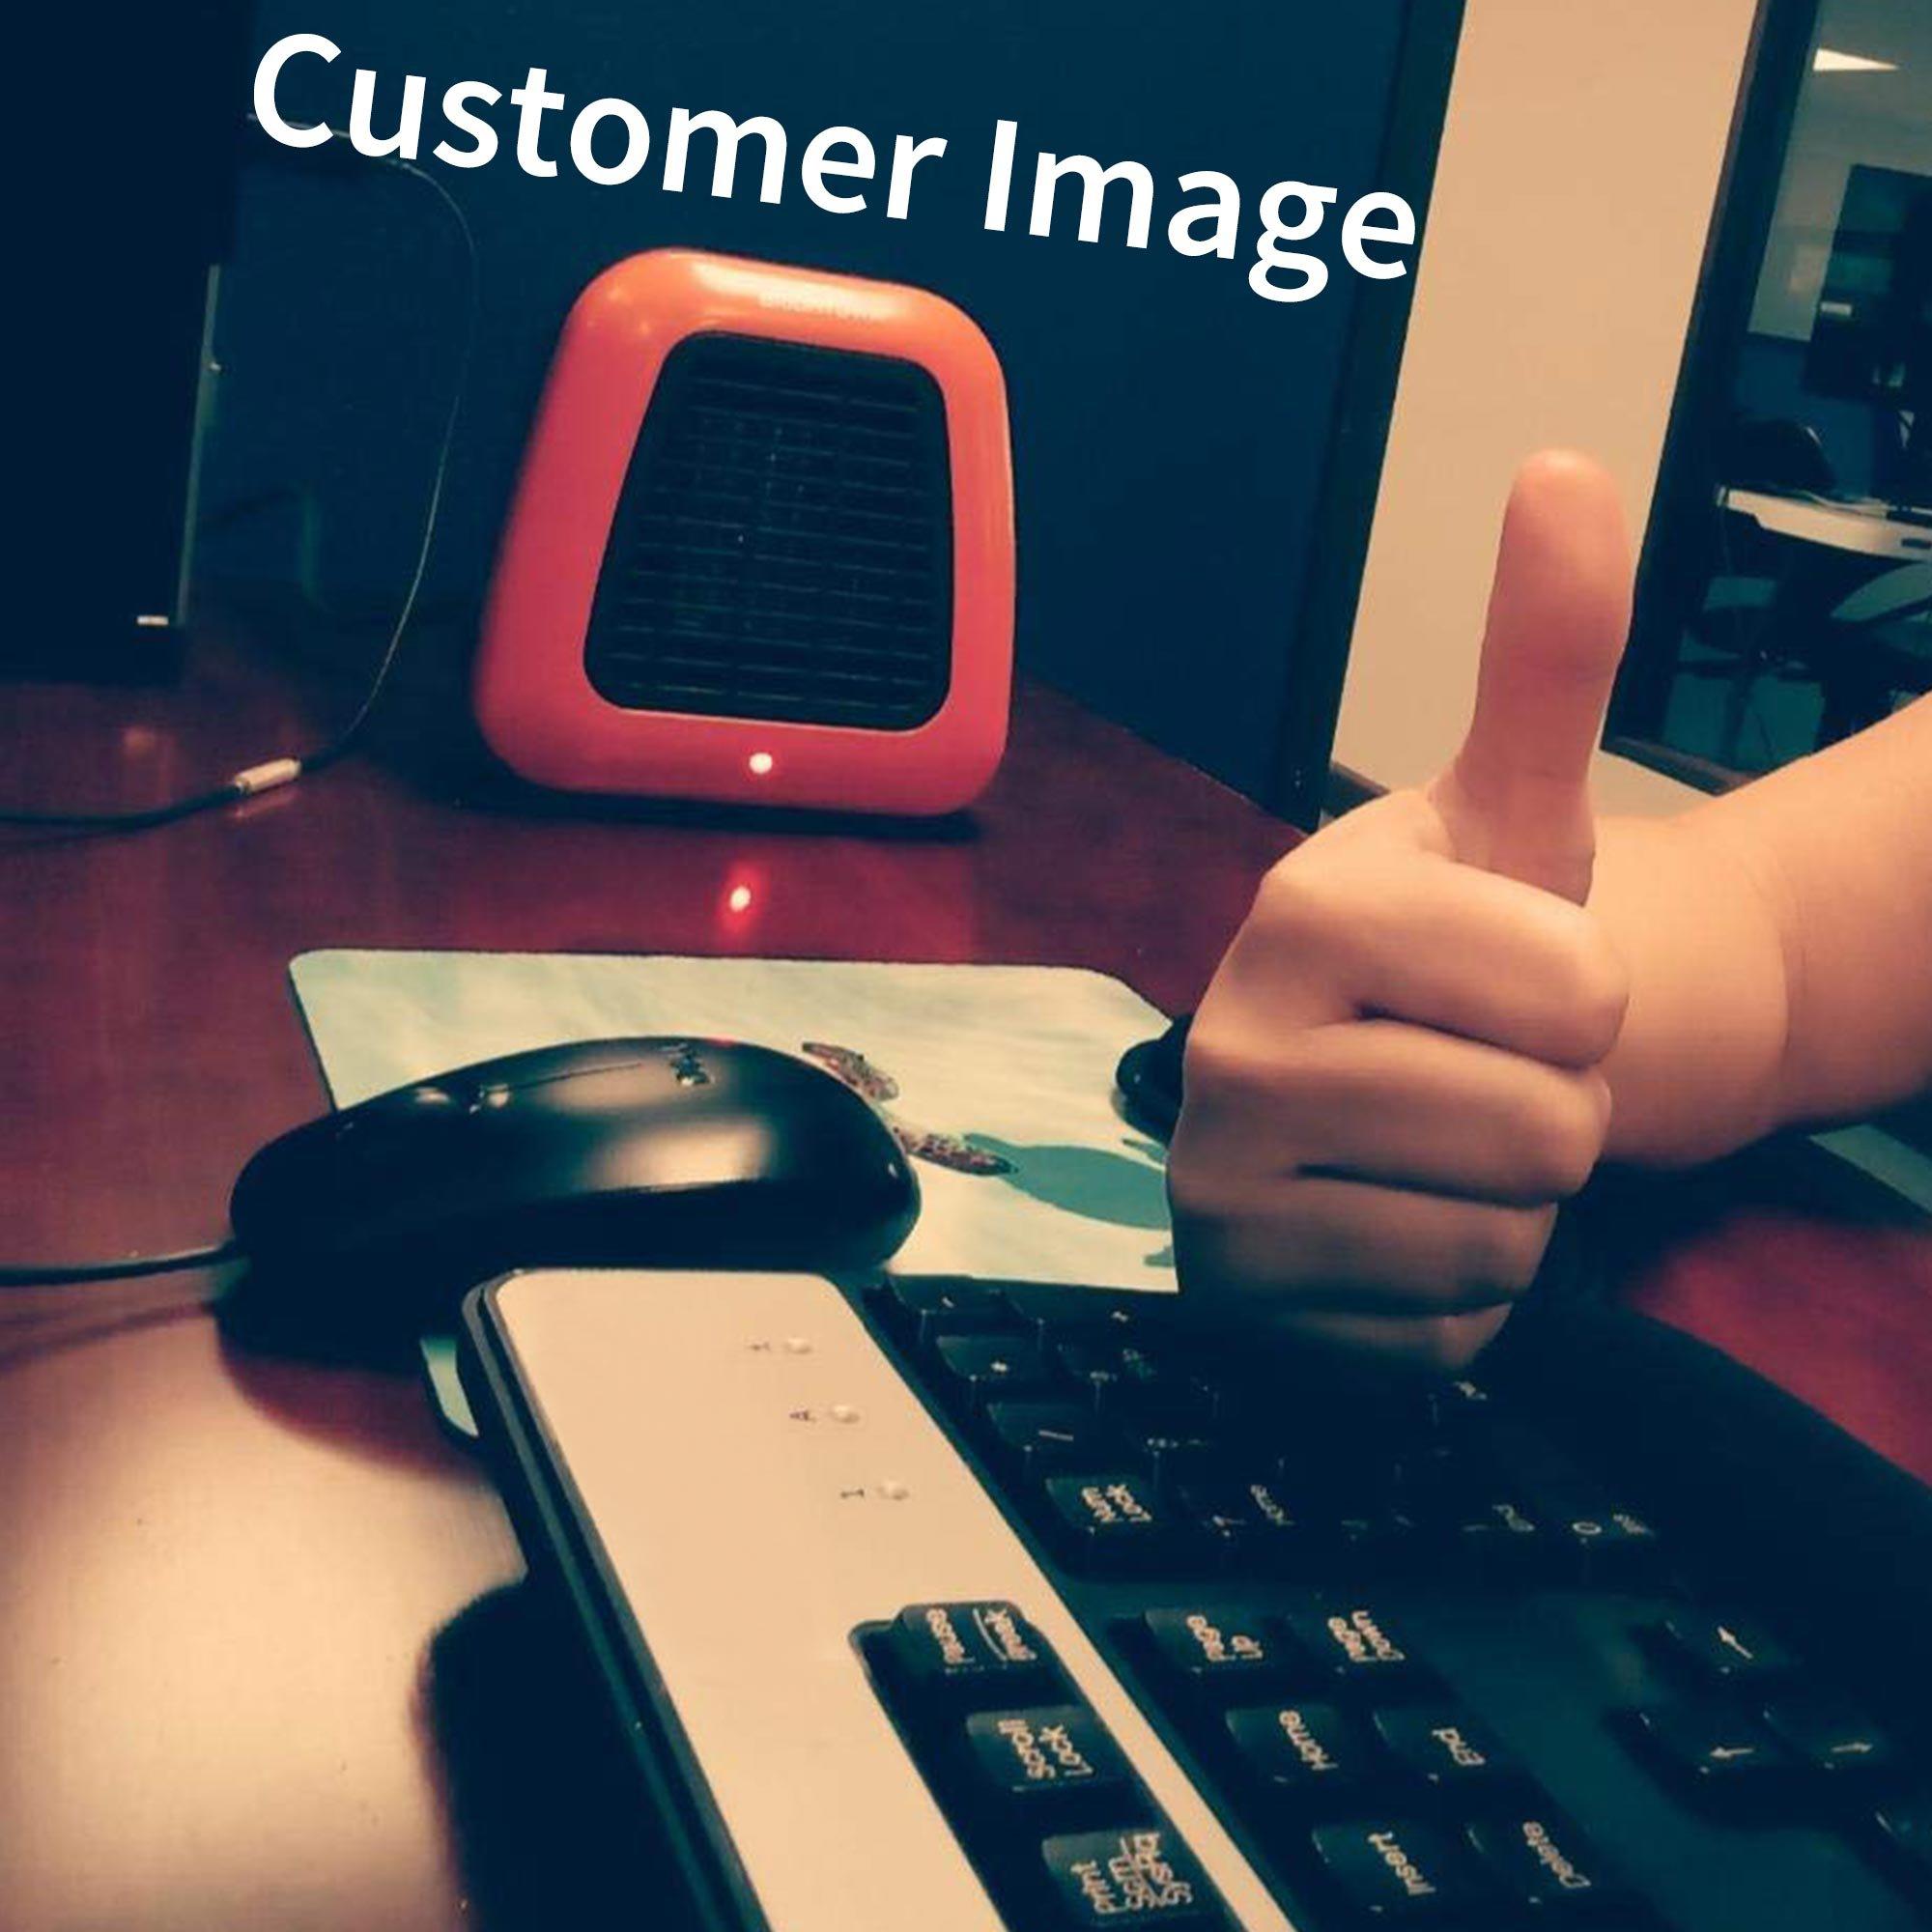 Personal Ceramic Portable-Mini Heater for Office Desktop Table Home Dorm, 400-Watt ETL Listed for Safe Use, Orange by Brightown (Image #7)